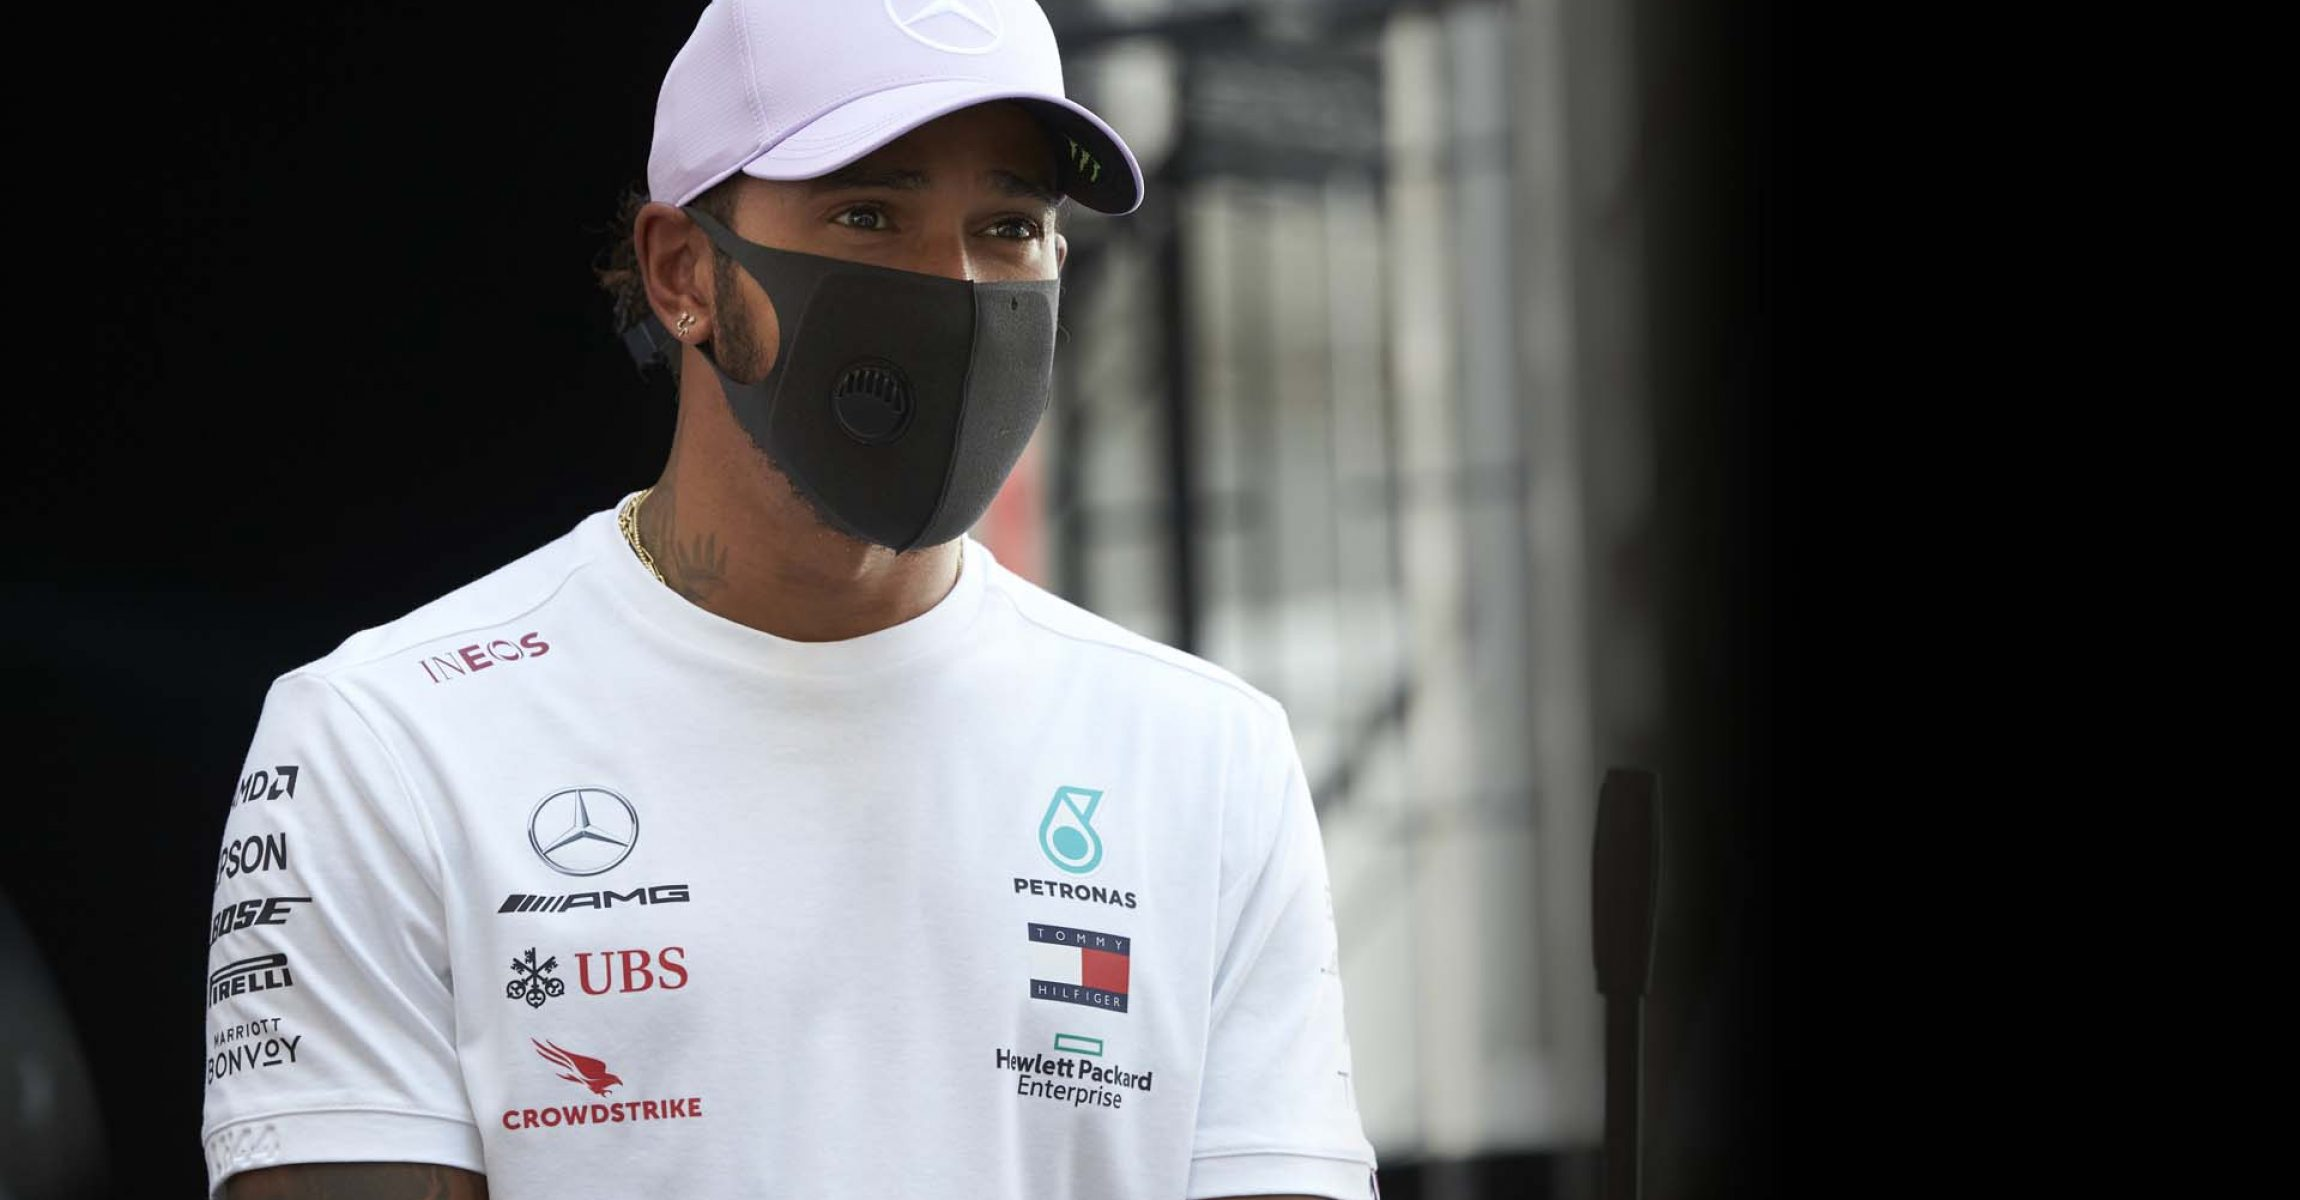 2020 Spanish Grand Prix, Thursday - Steve Etherington Lewis Hamilton Mercedes